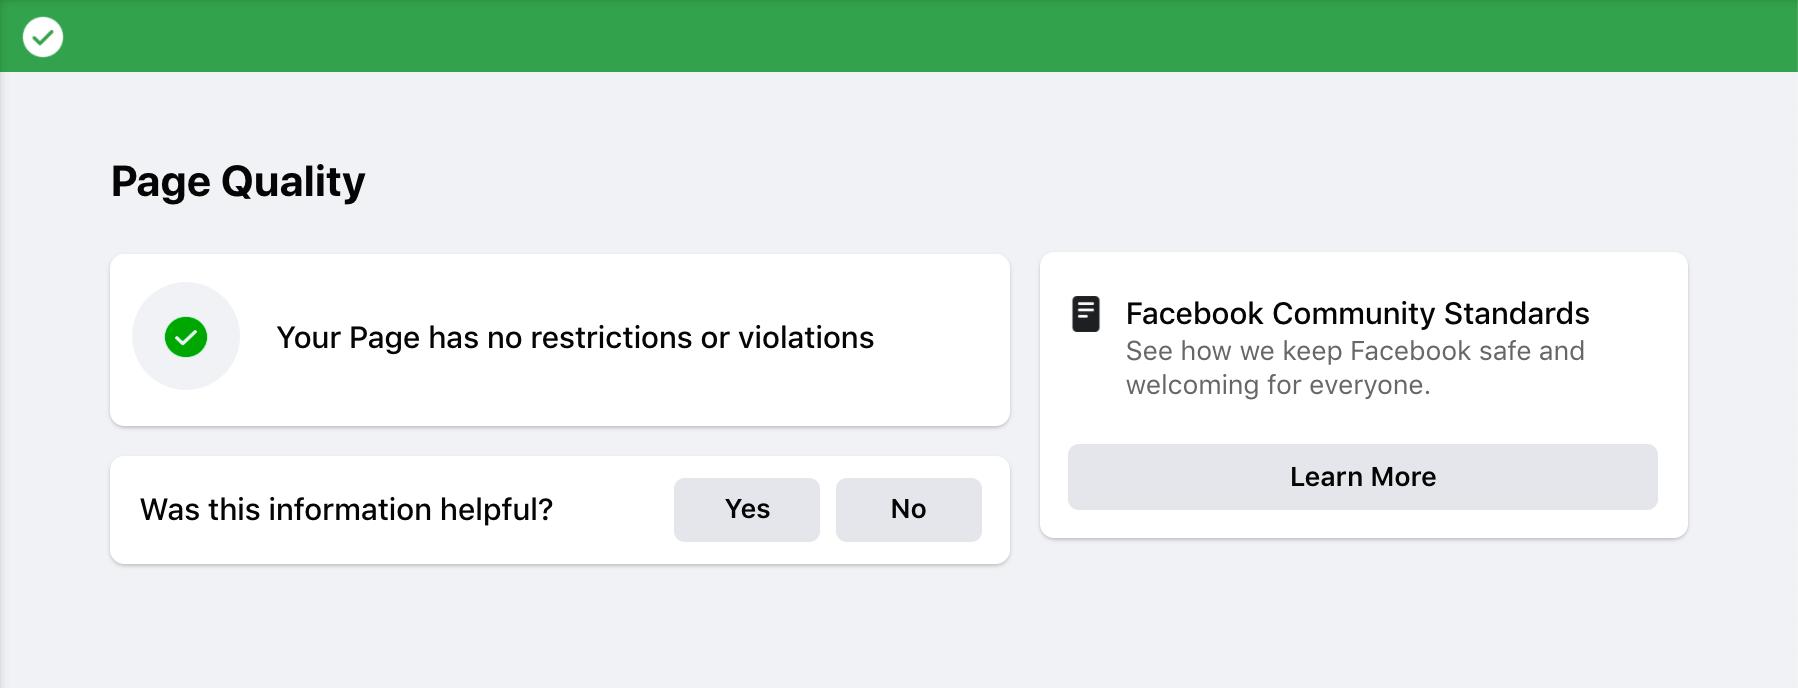 how-to-unblock-a-blocked-url-on-facebook-3如何解除对Facebook上被阻止URL的阻止